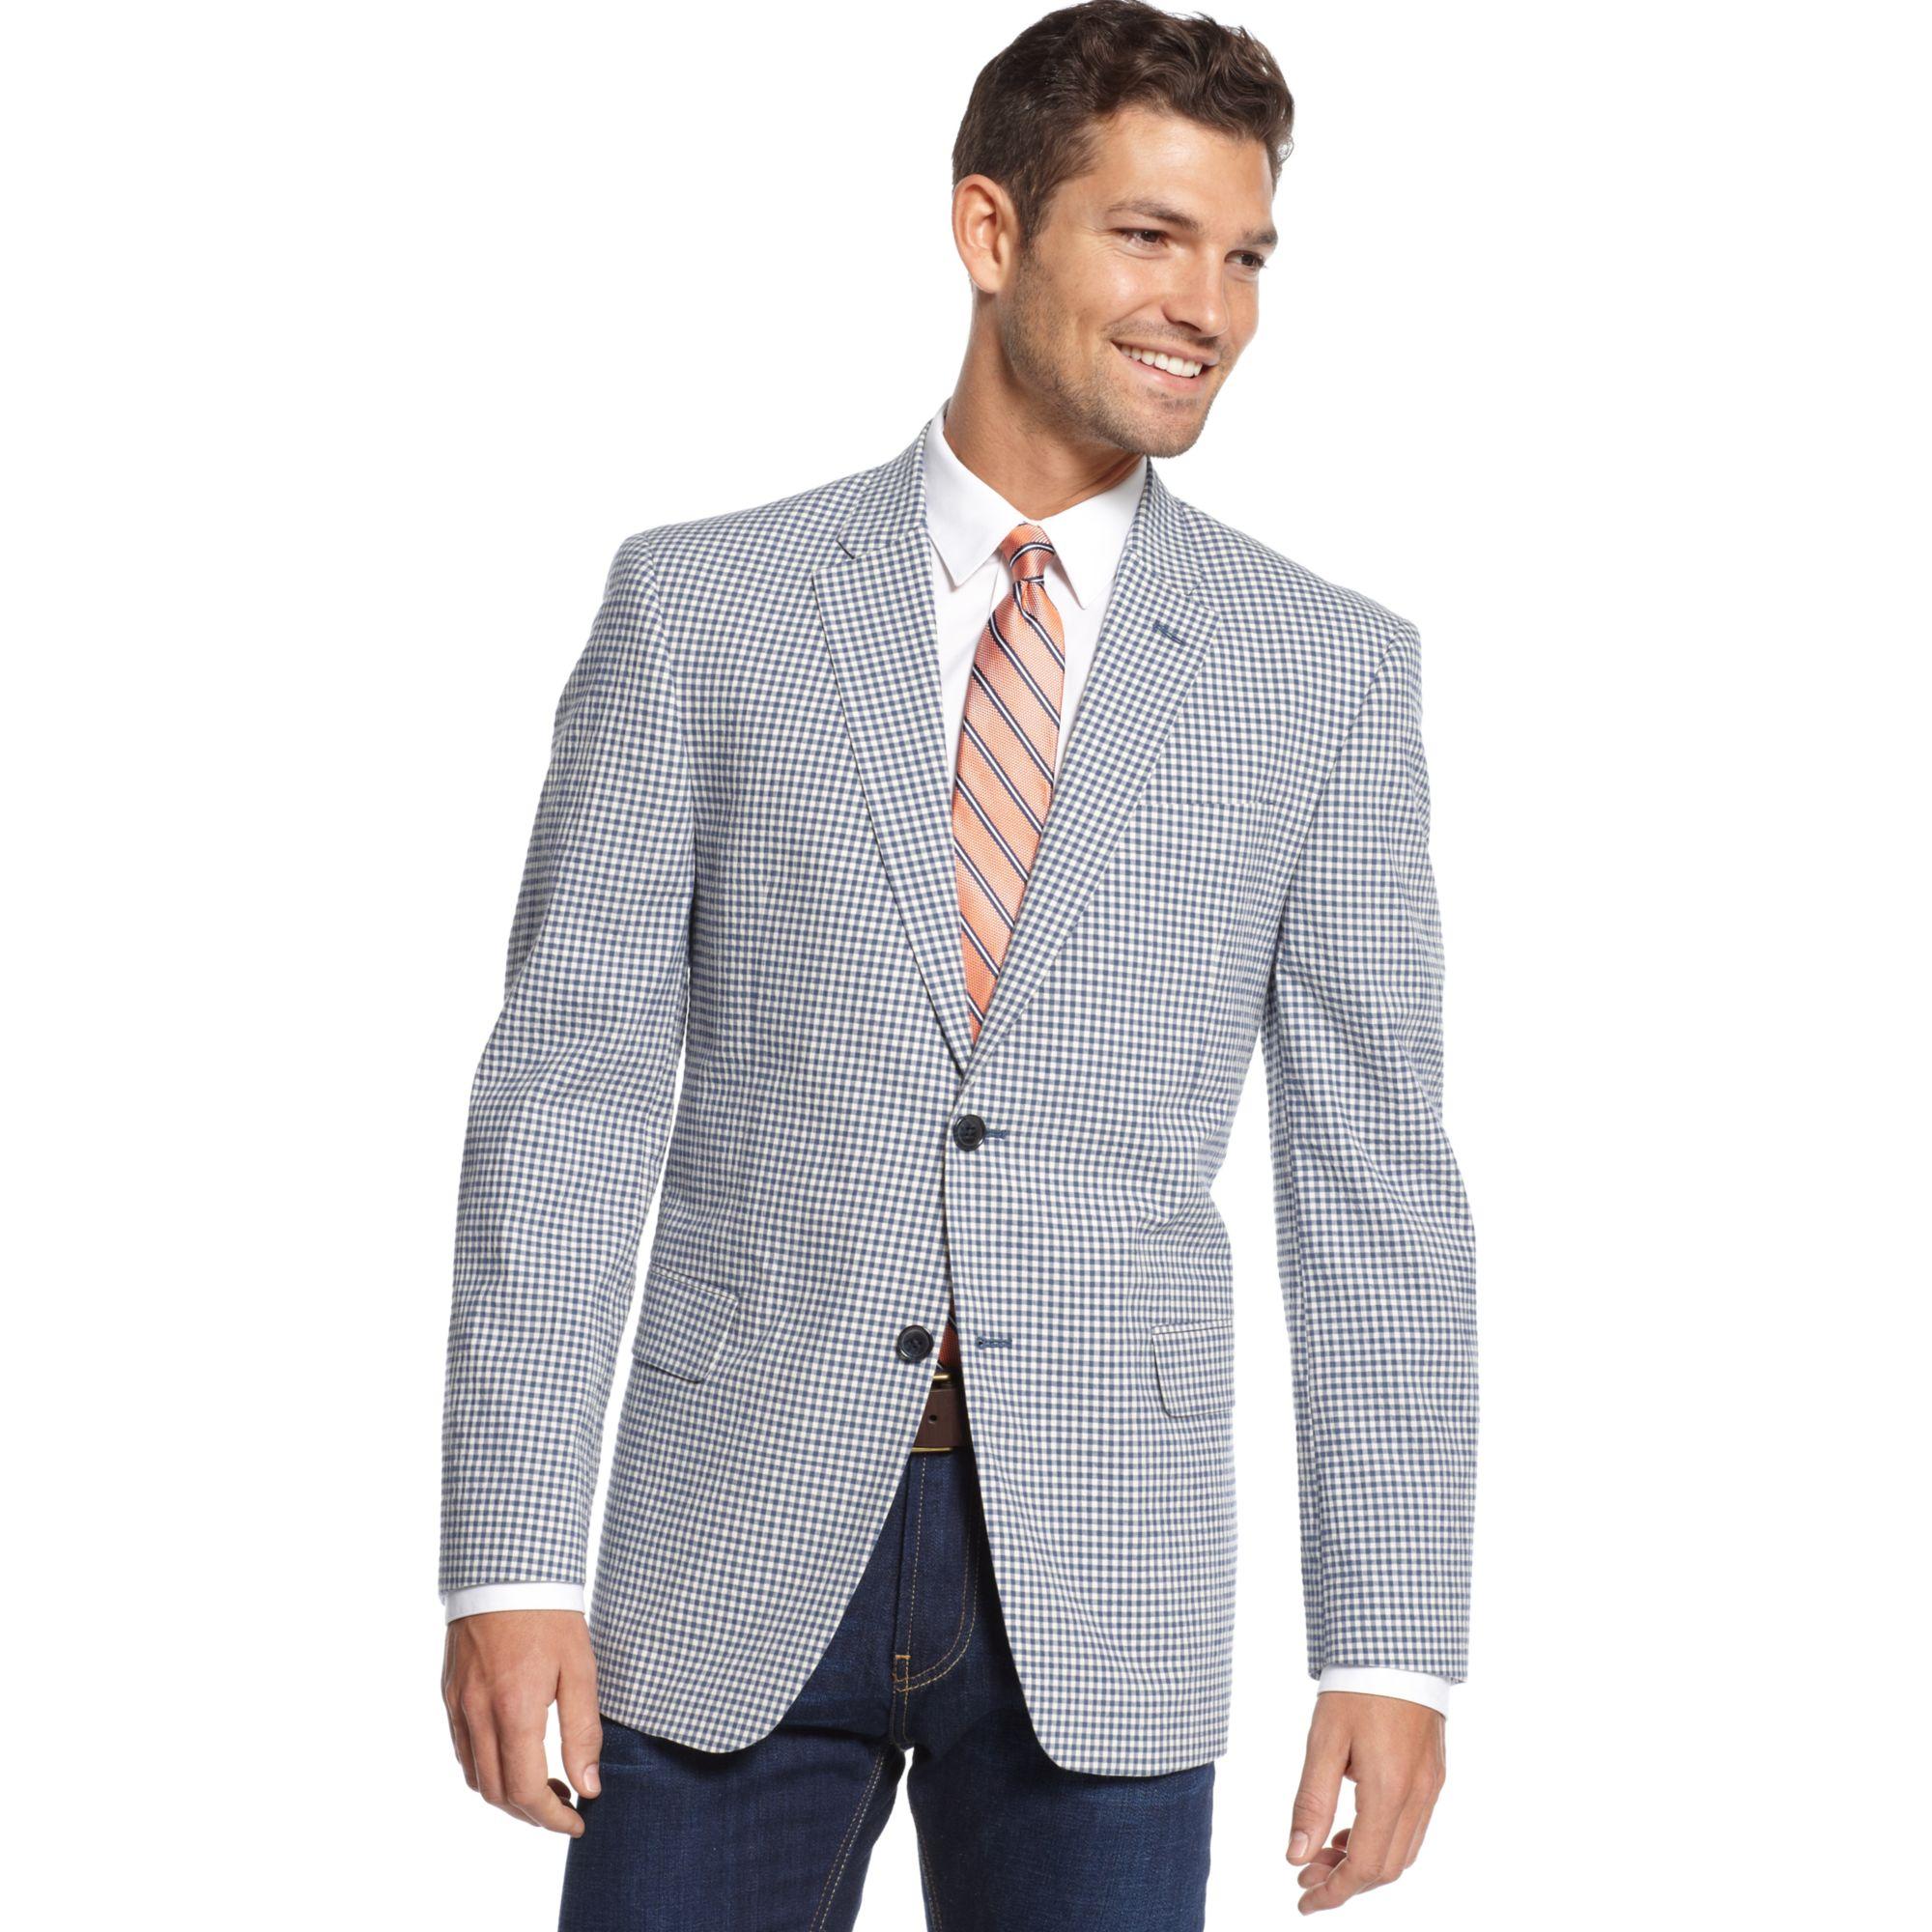 Tommy Hilfiger Seersucker Check Sport Coat Slim Fit In Blue White